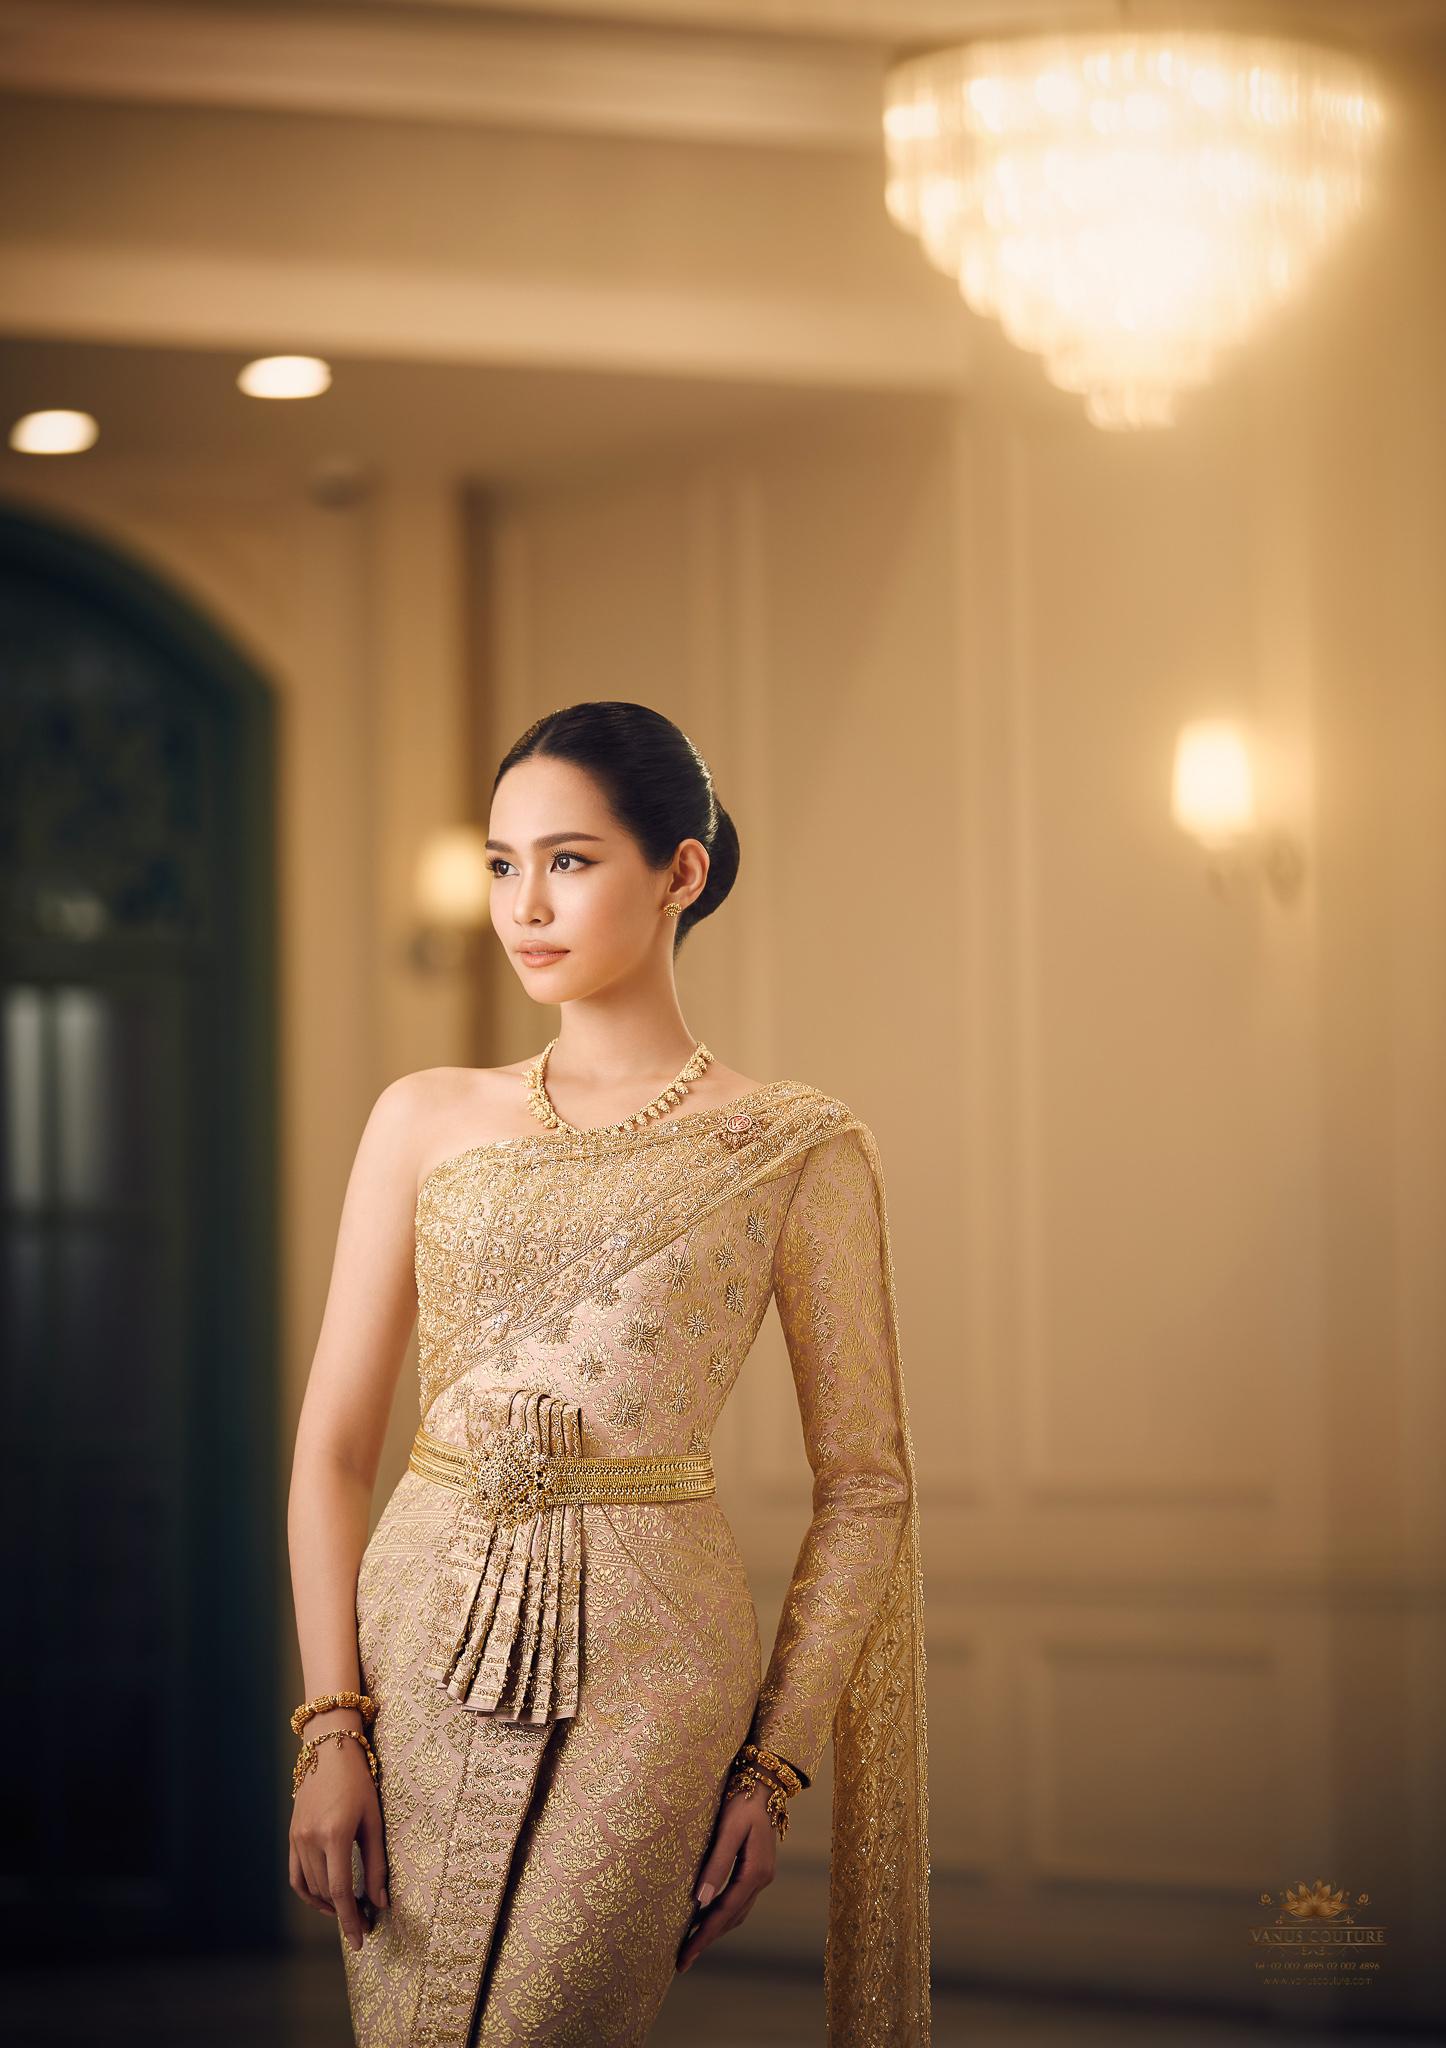 Thai traditional dress - Bint 09